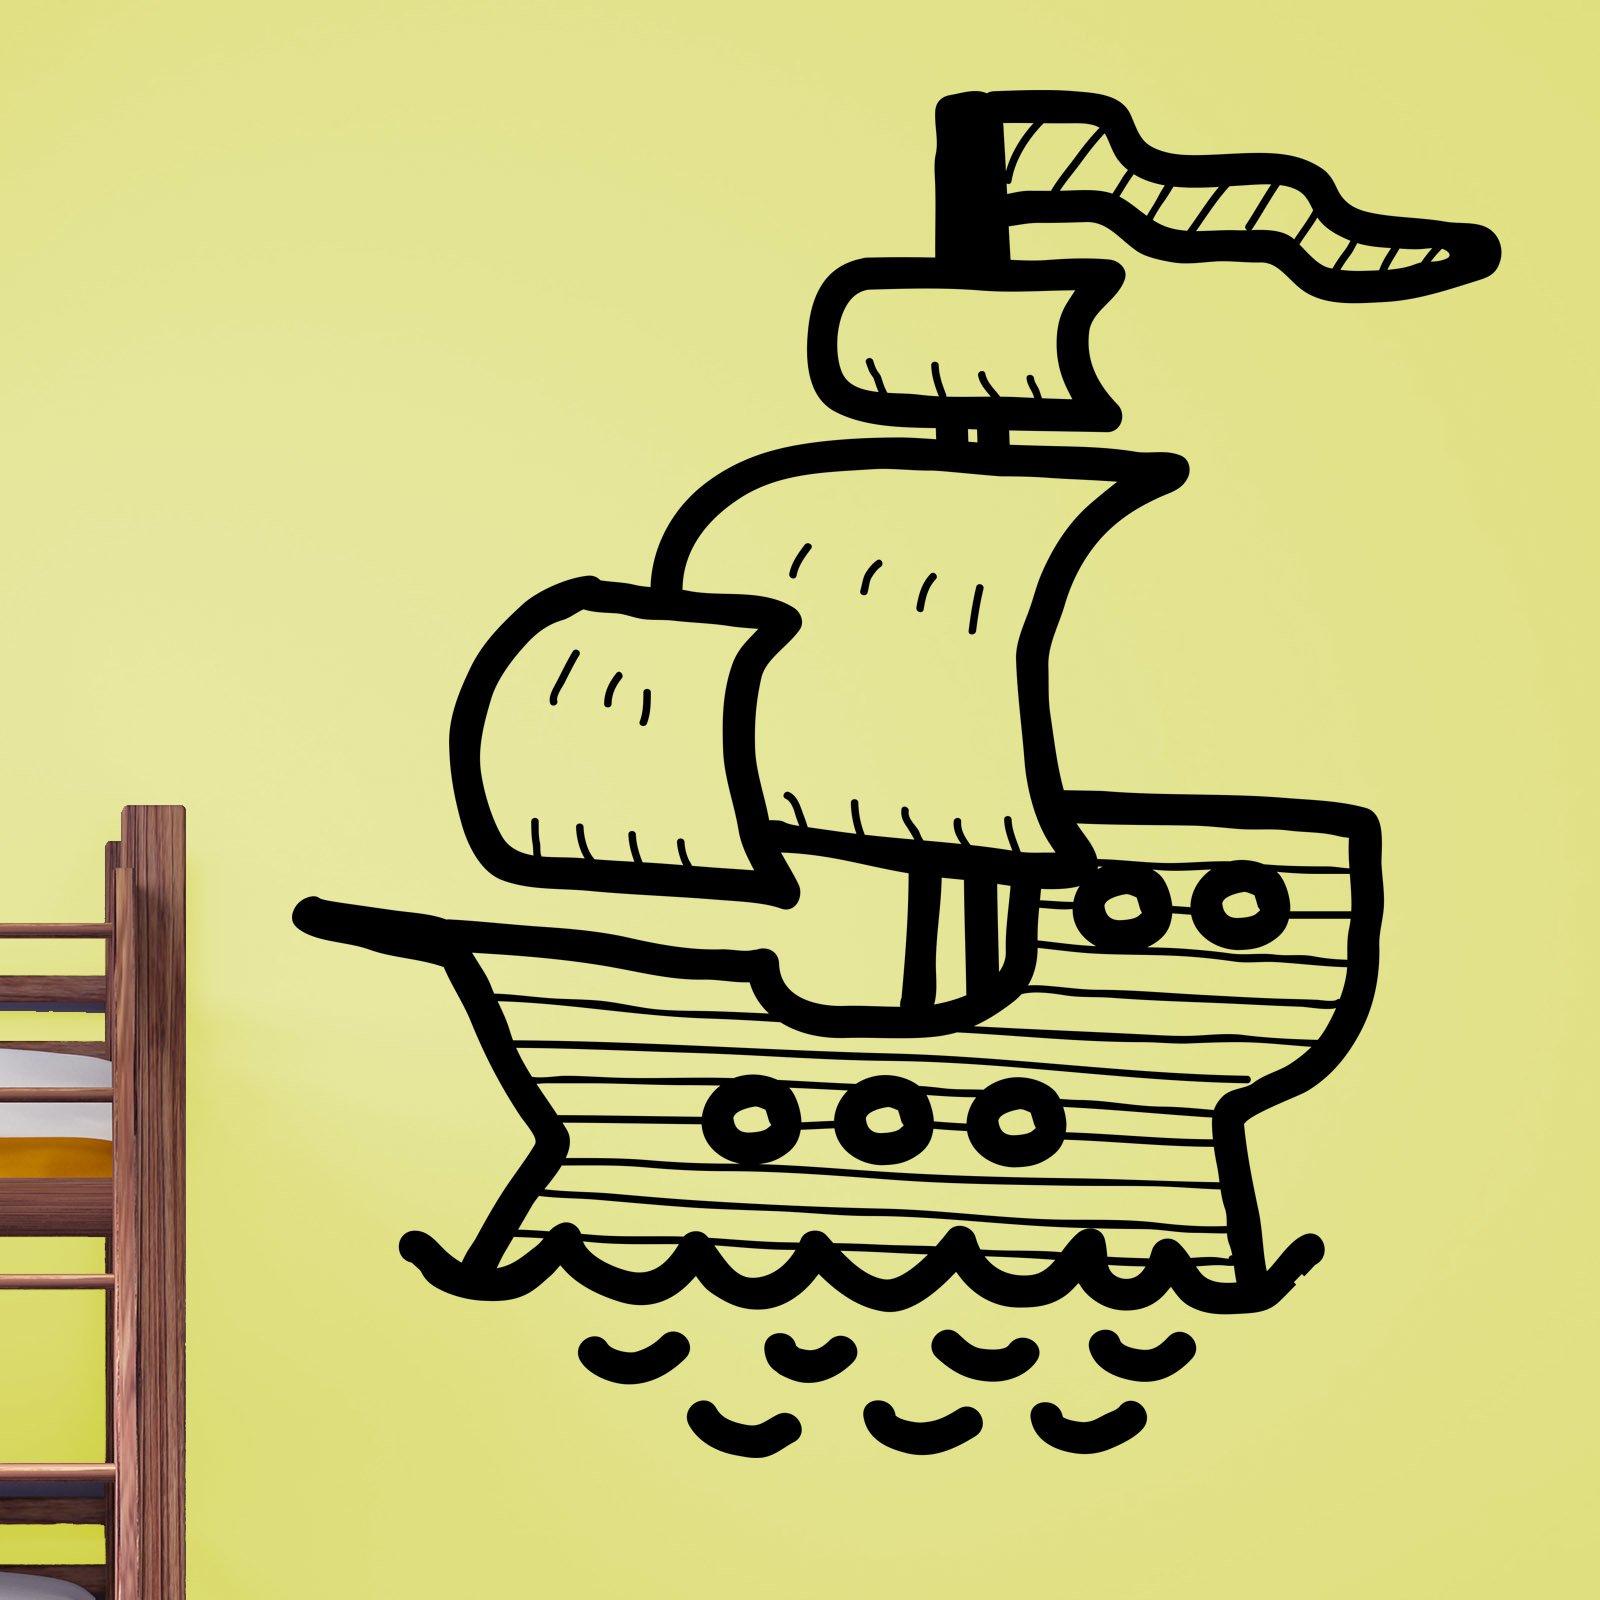 Cartoon Pirate Ship Kids Wall Sticker - World of Wall Stickers